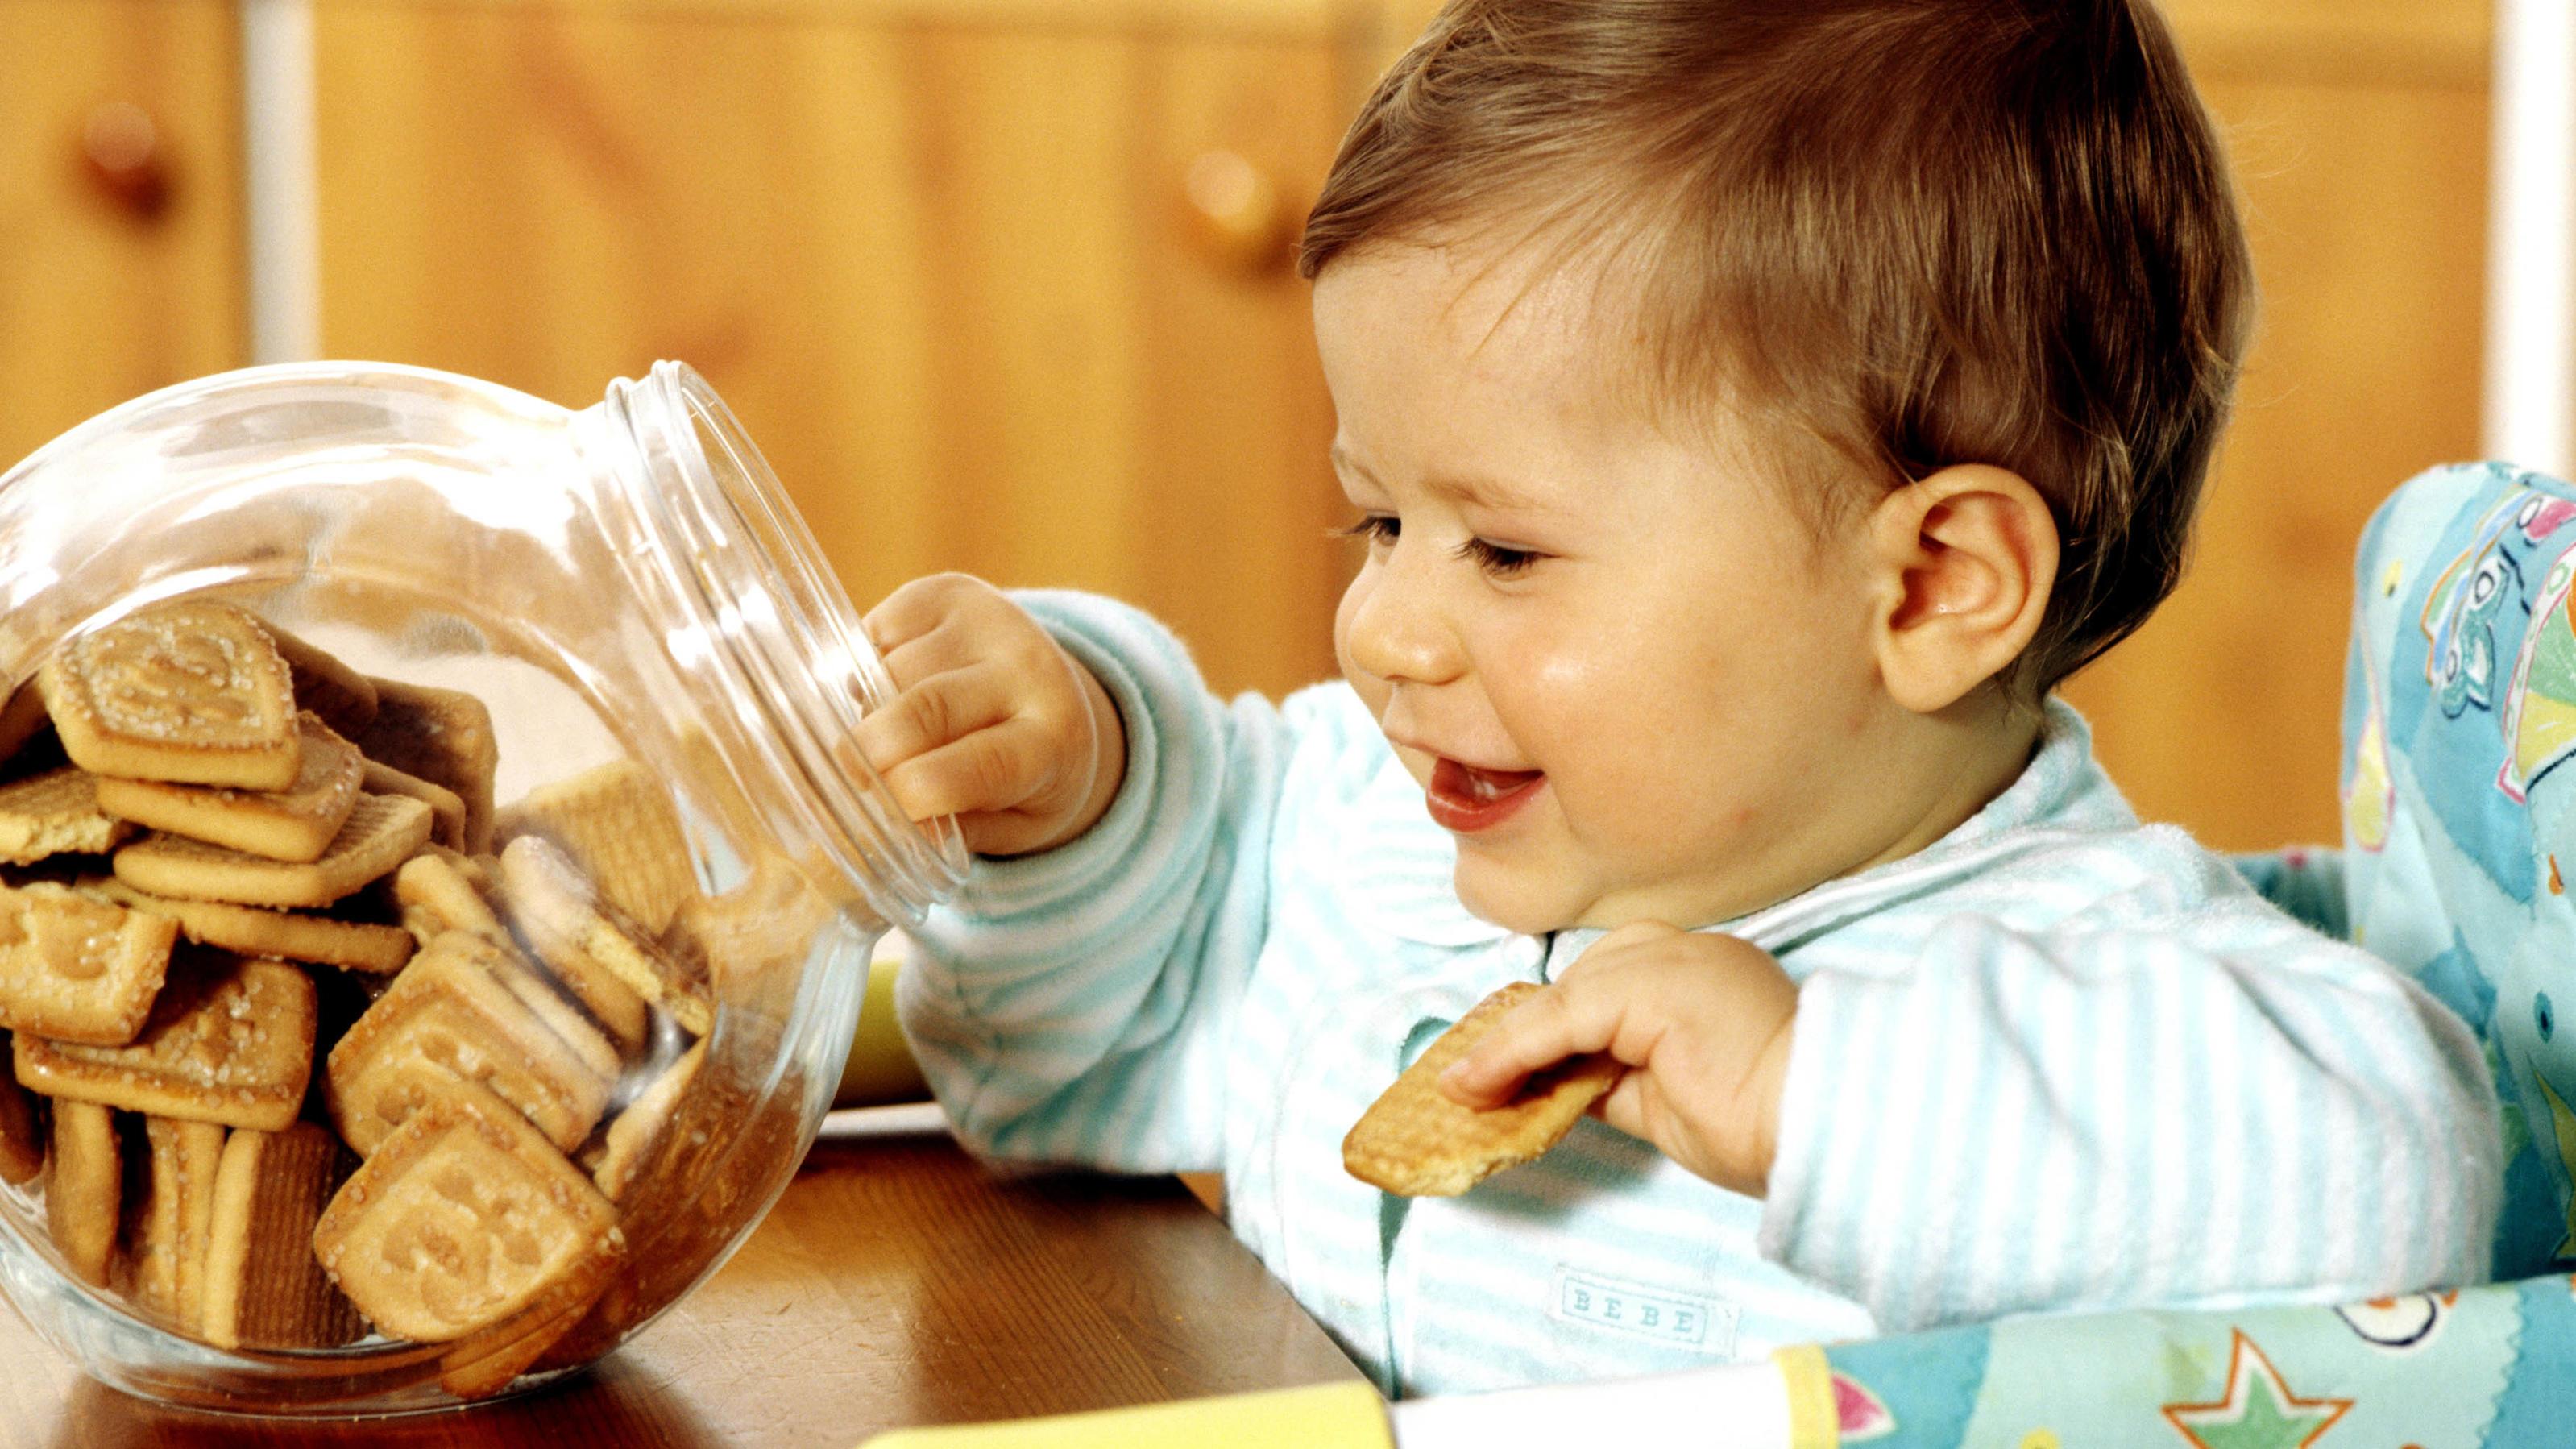 Baby greift nach Keksdose